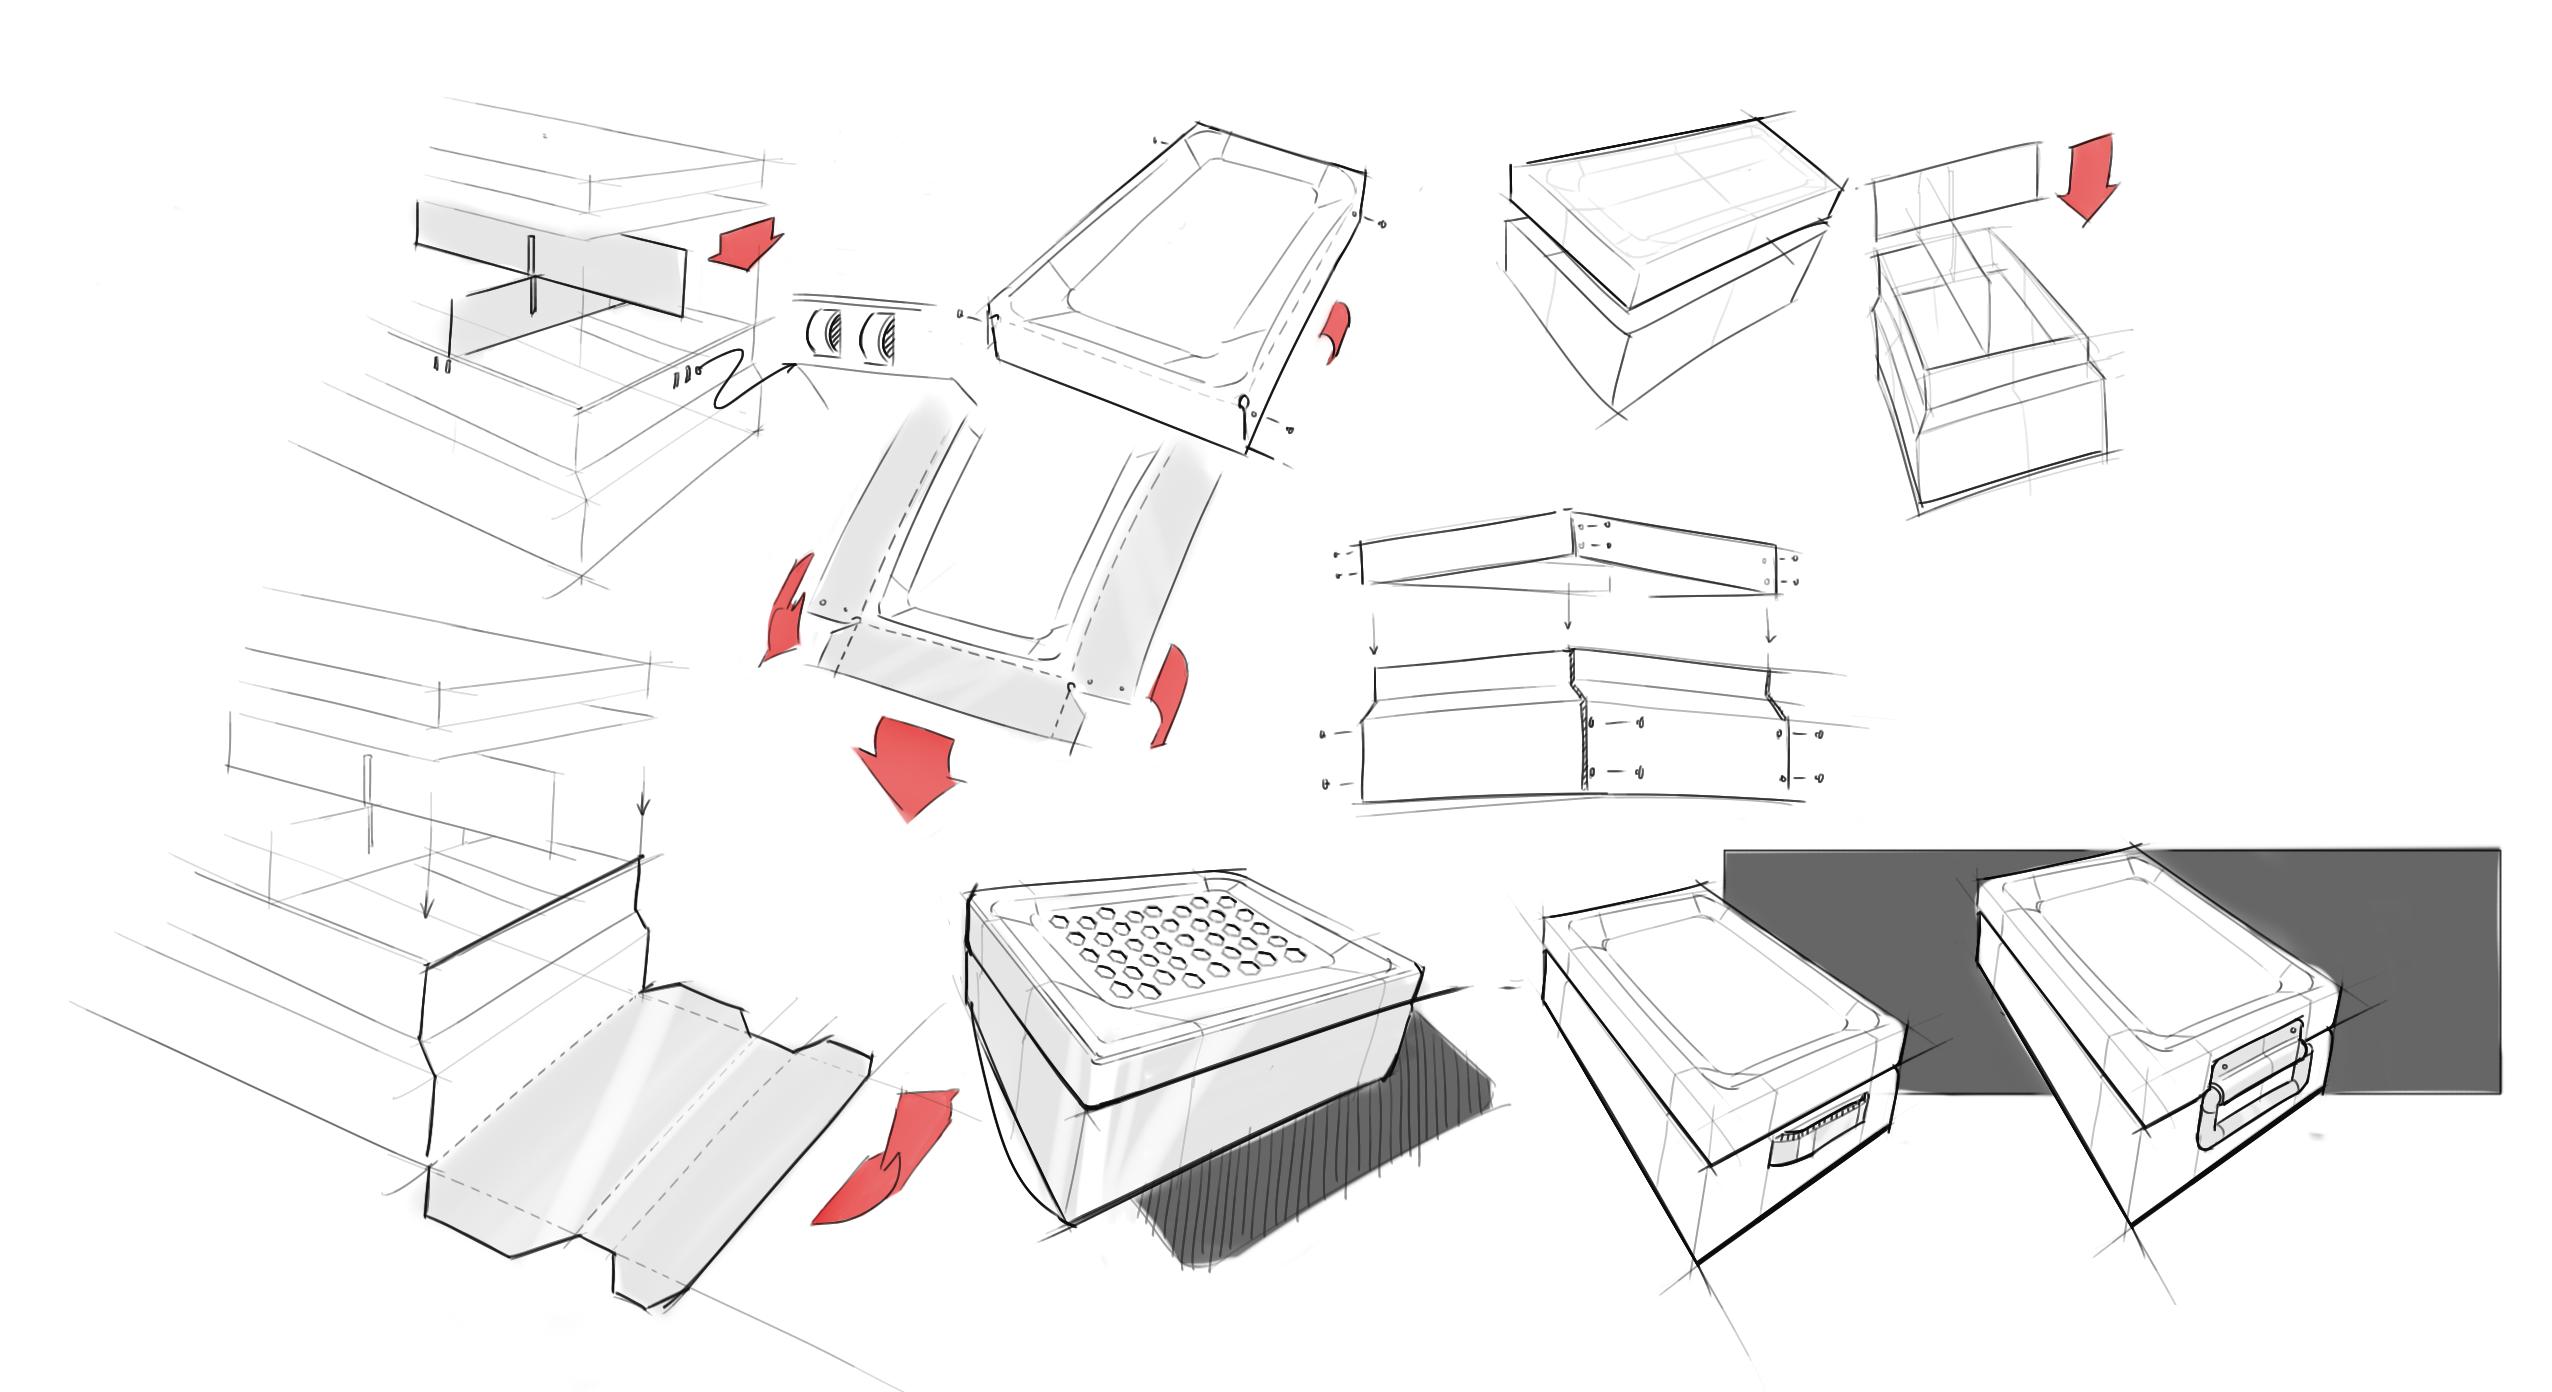 Fume cupboard concept sketches